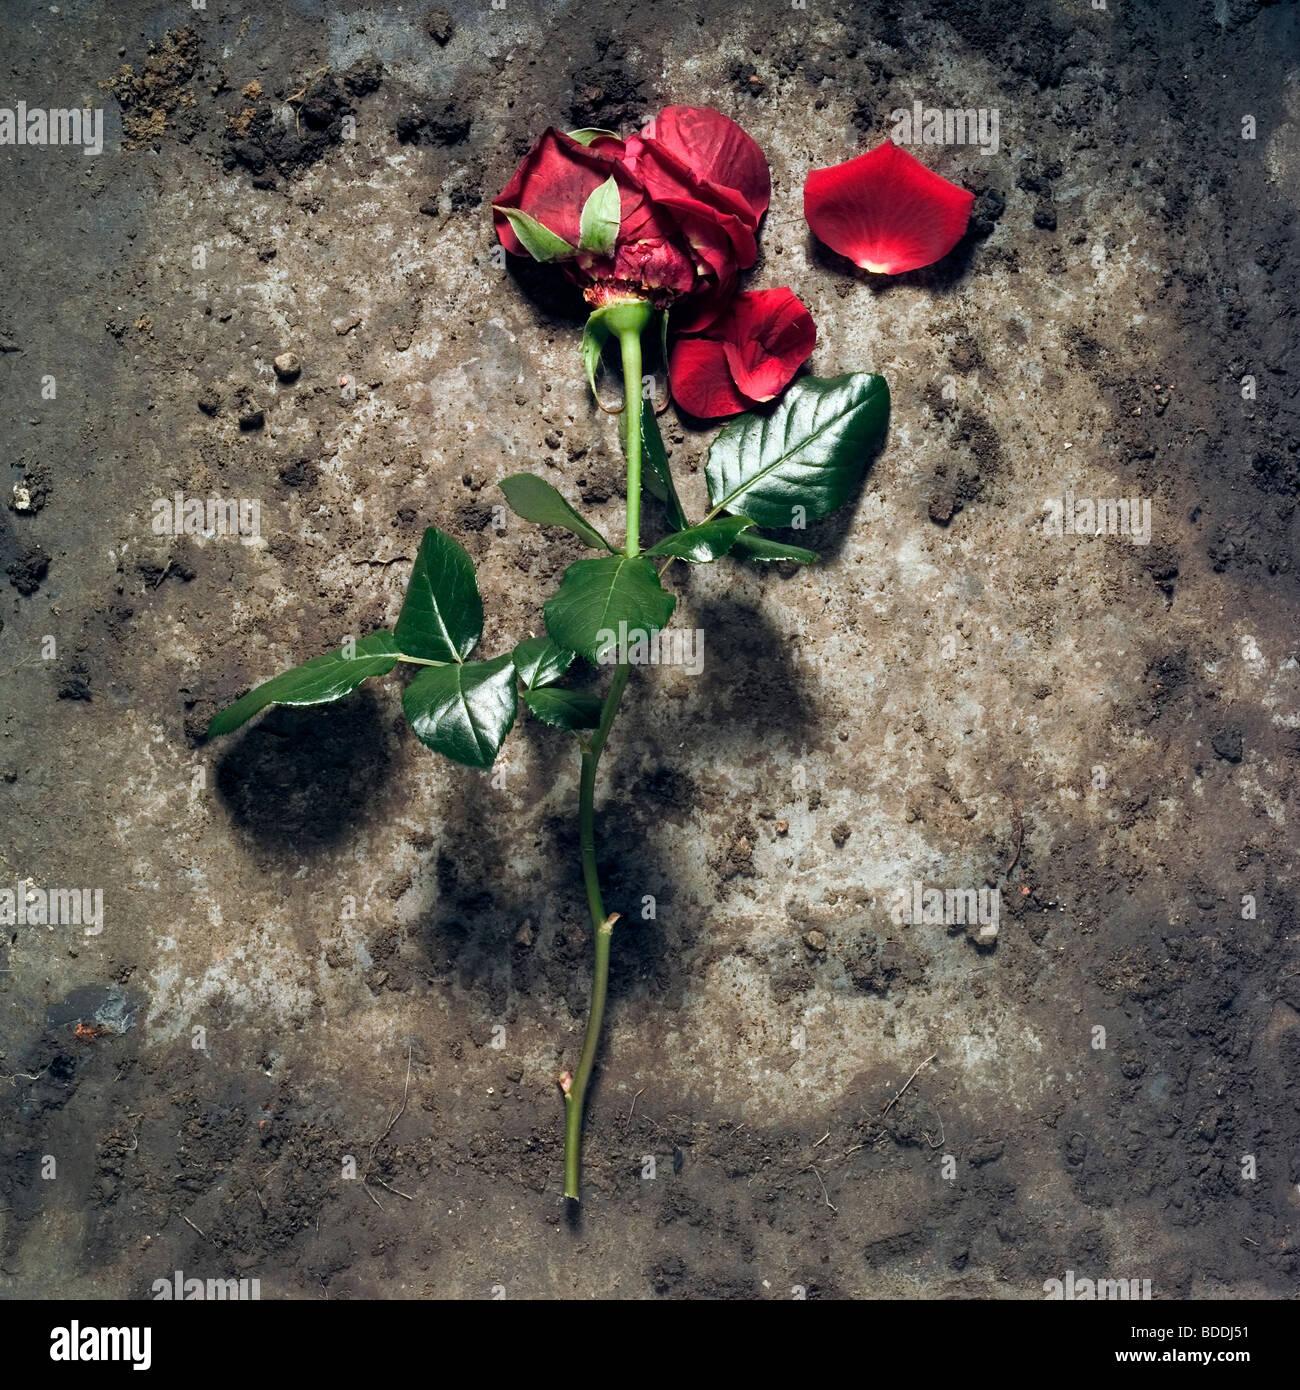 Rosa roja descartados Imagen De Stock